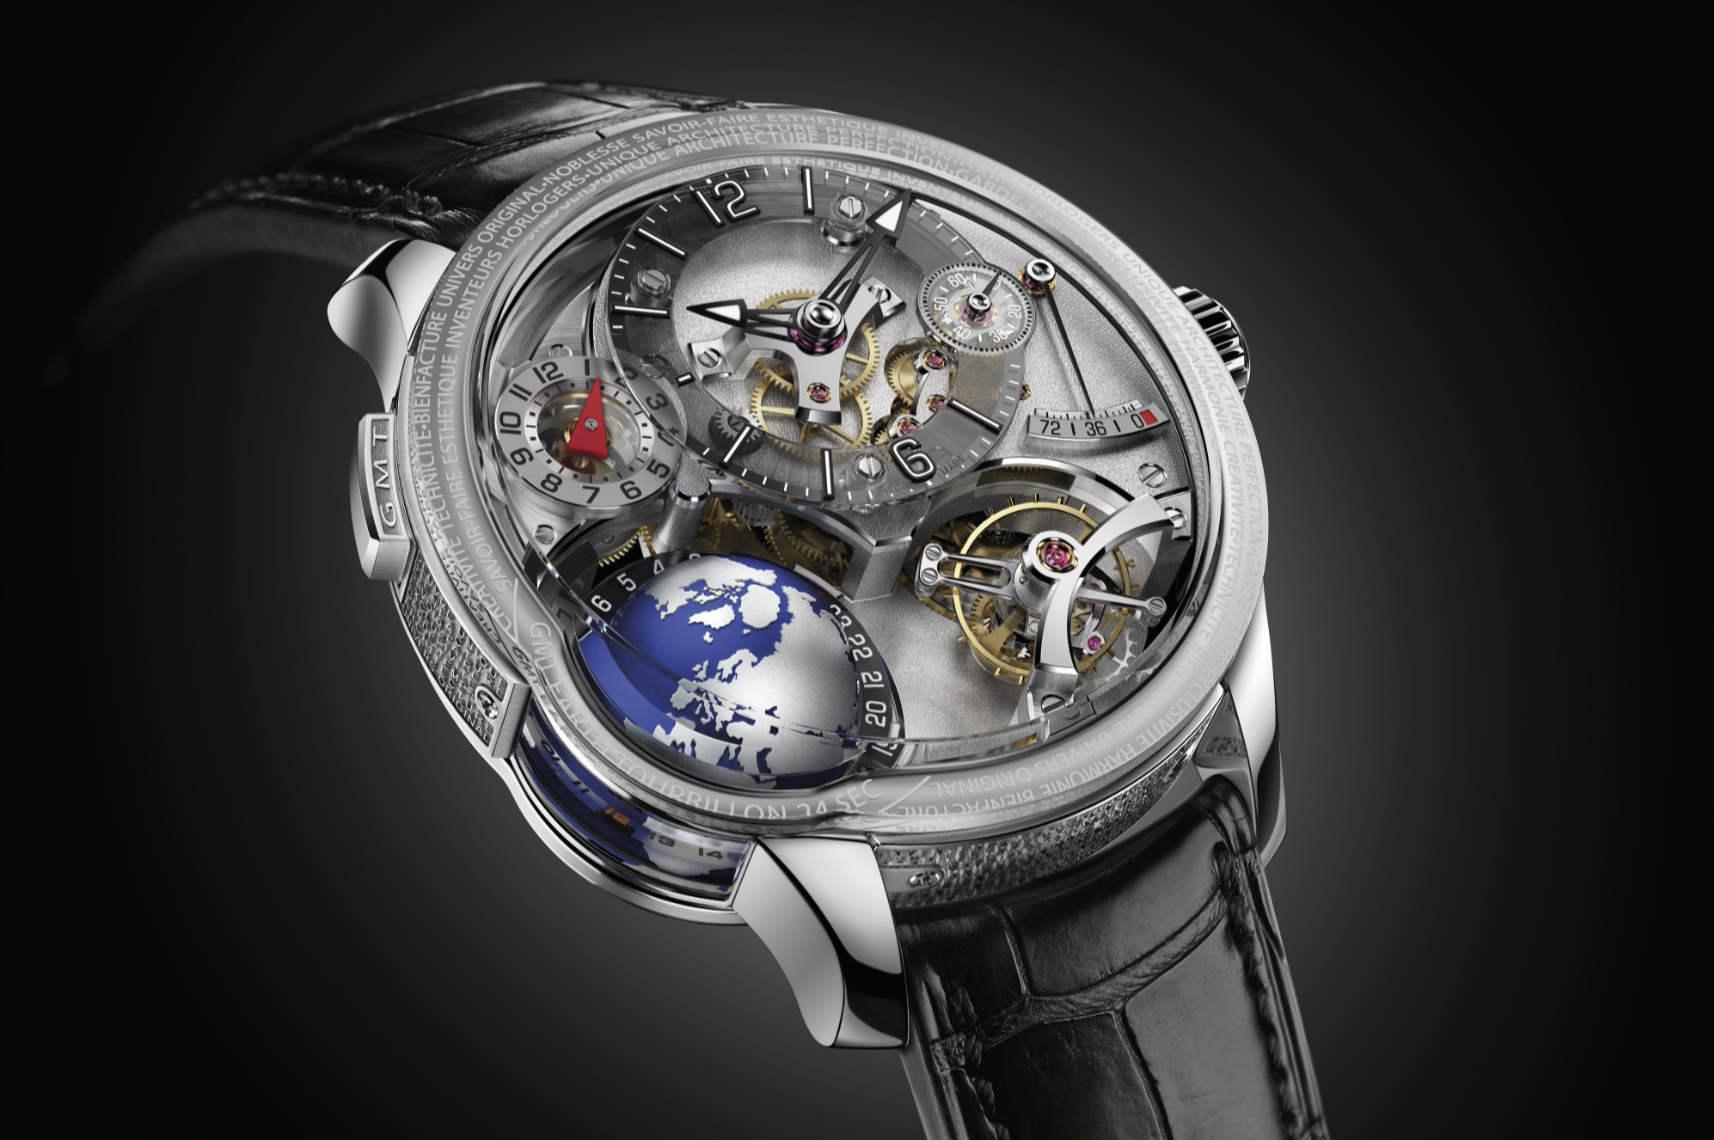 Greubel Forsey wristwatch